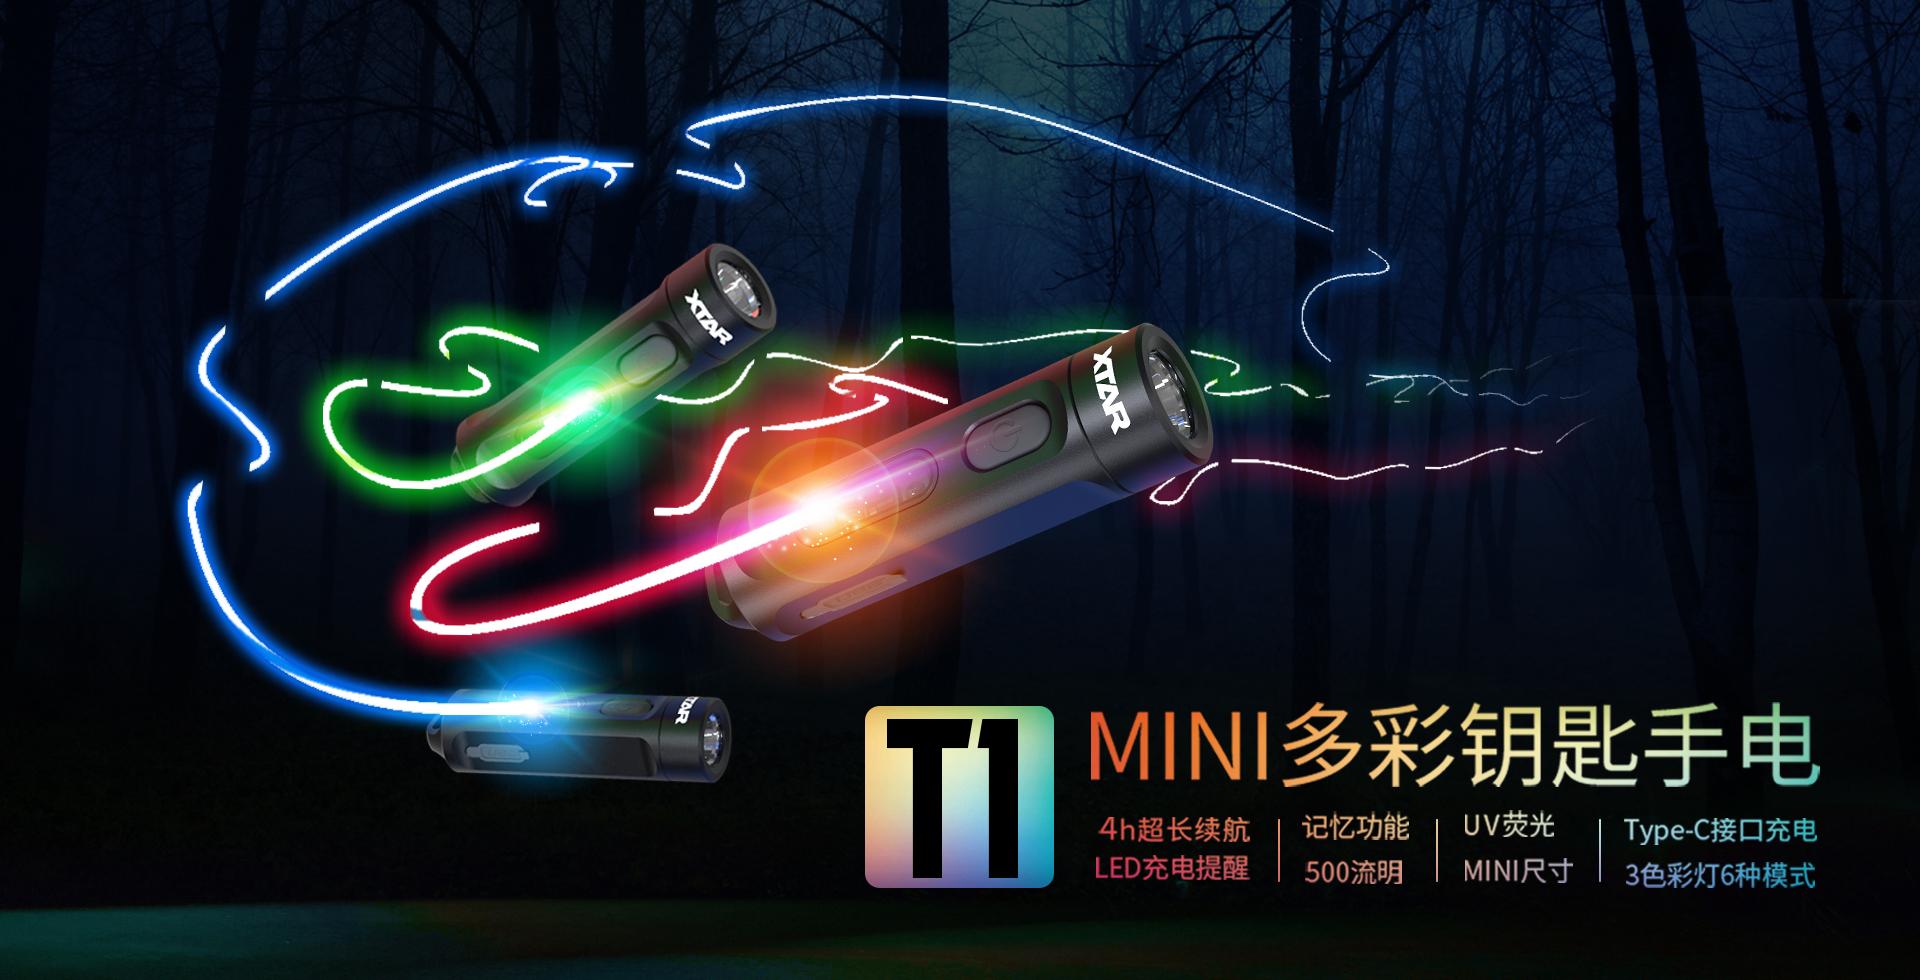 T1中文首焦图.jpg